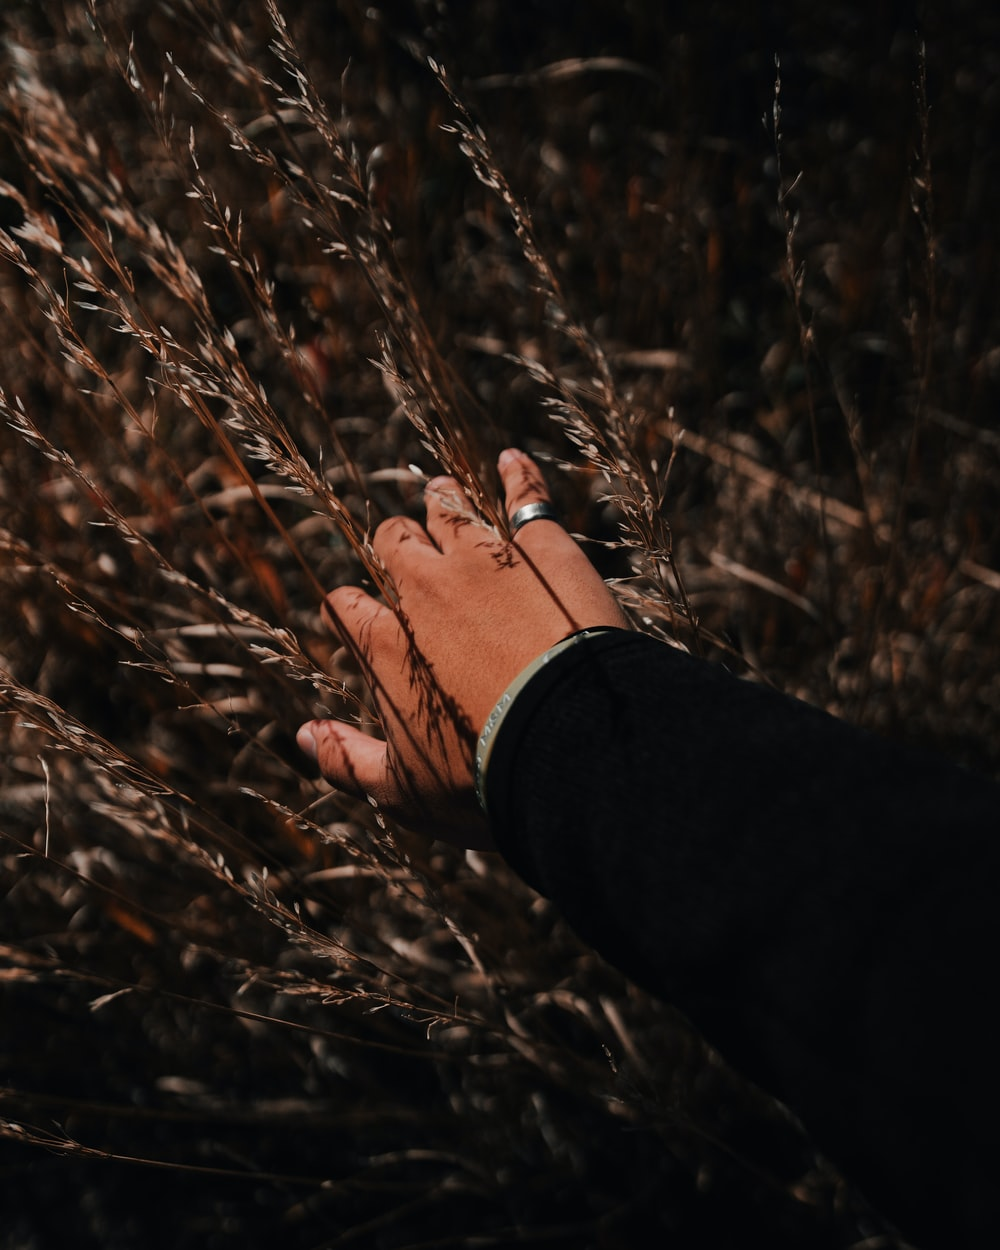 man's hand on plants